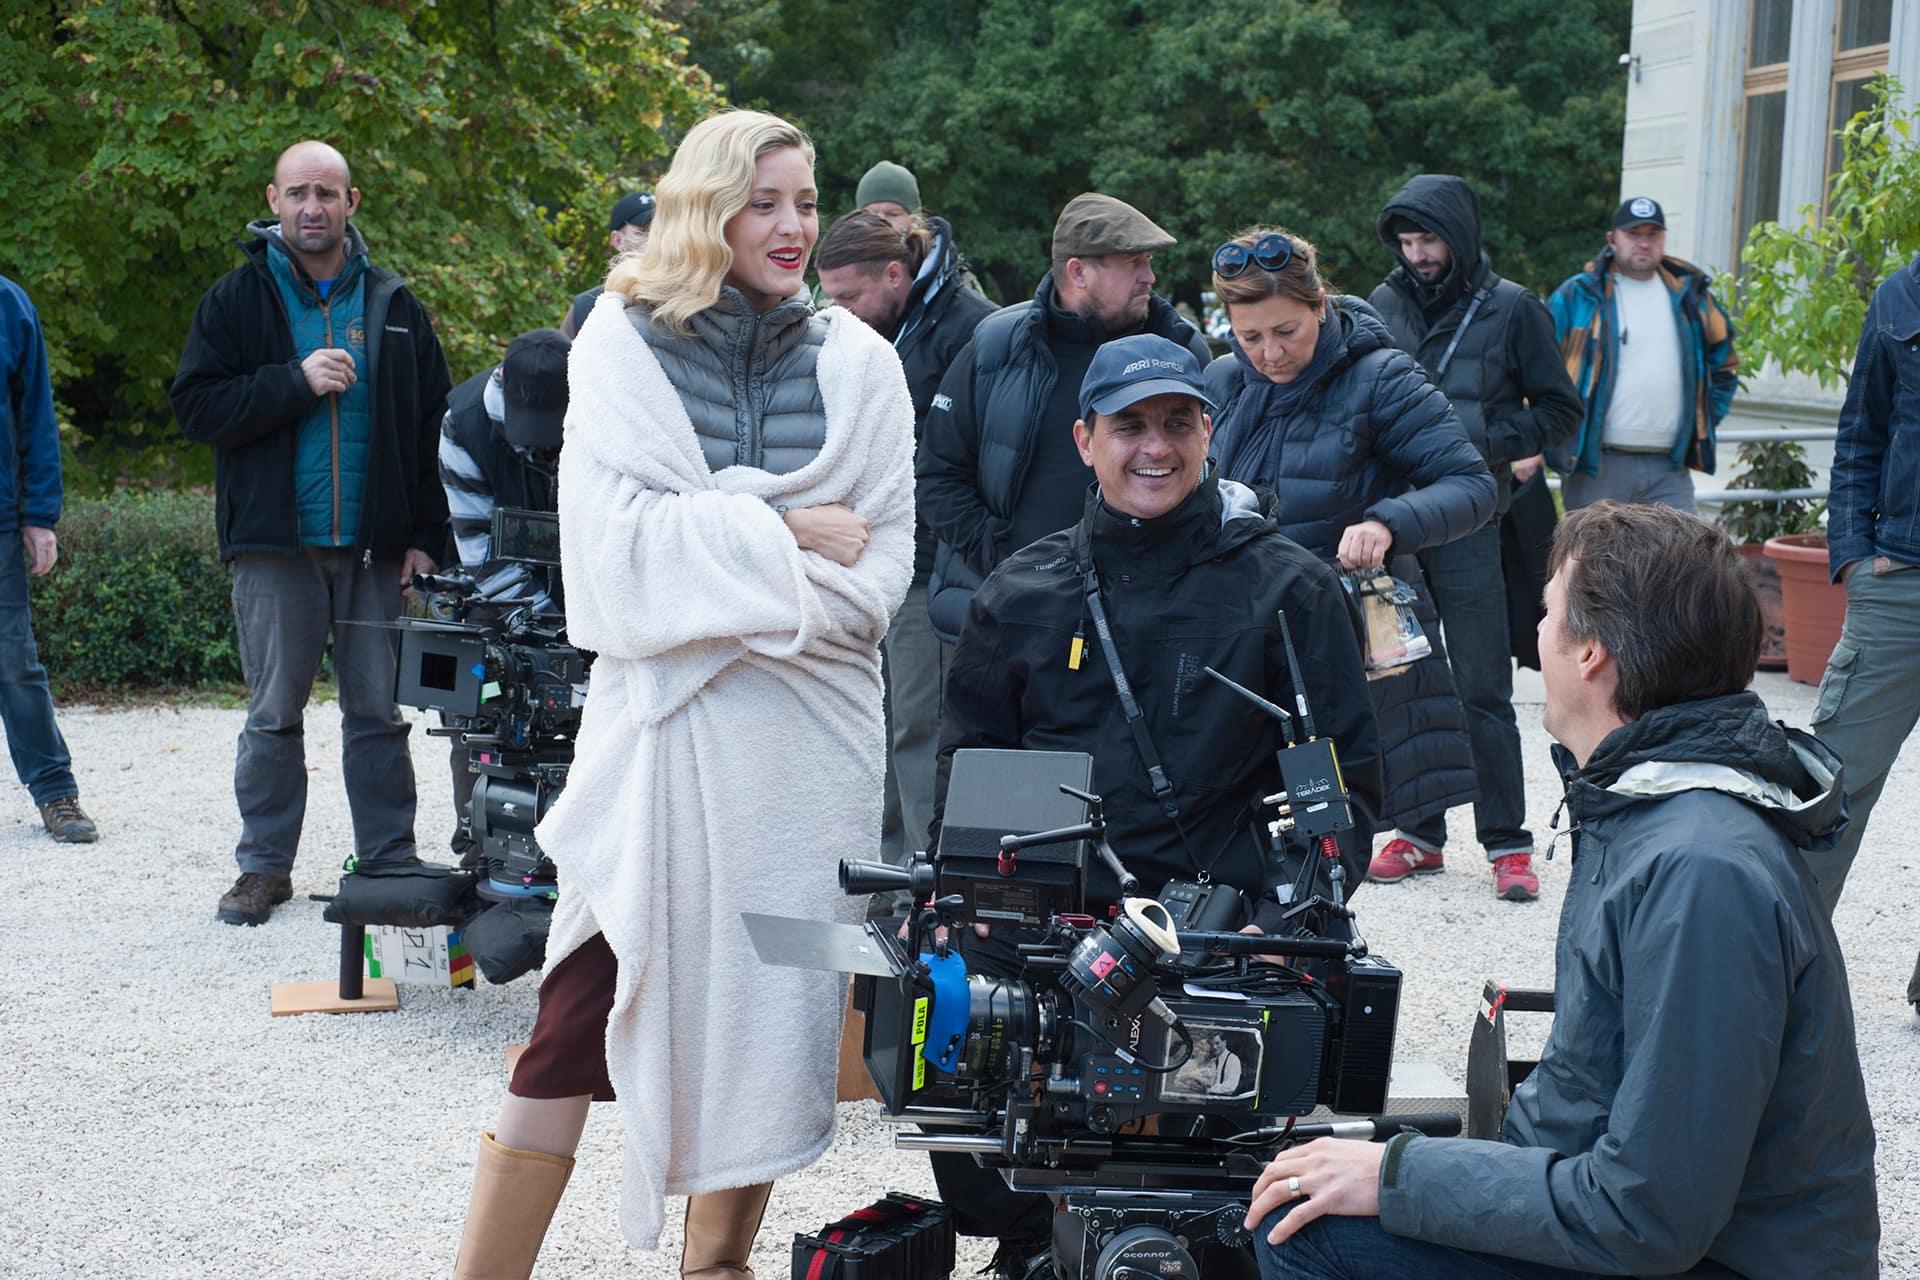 Behind the scenes on the set of X Company Season 3 with Evelyne Brochu (Aurora), 1st AC István Gottmann and